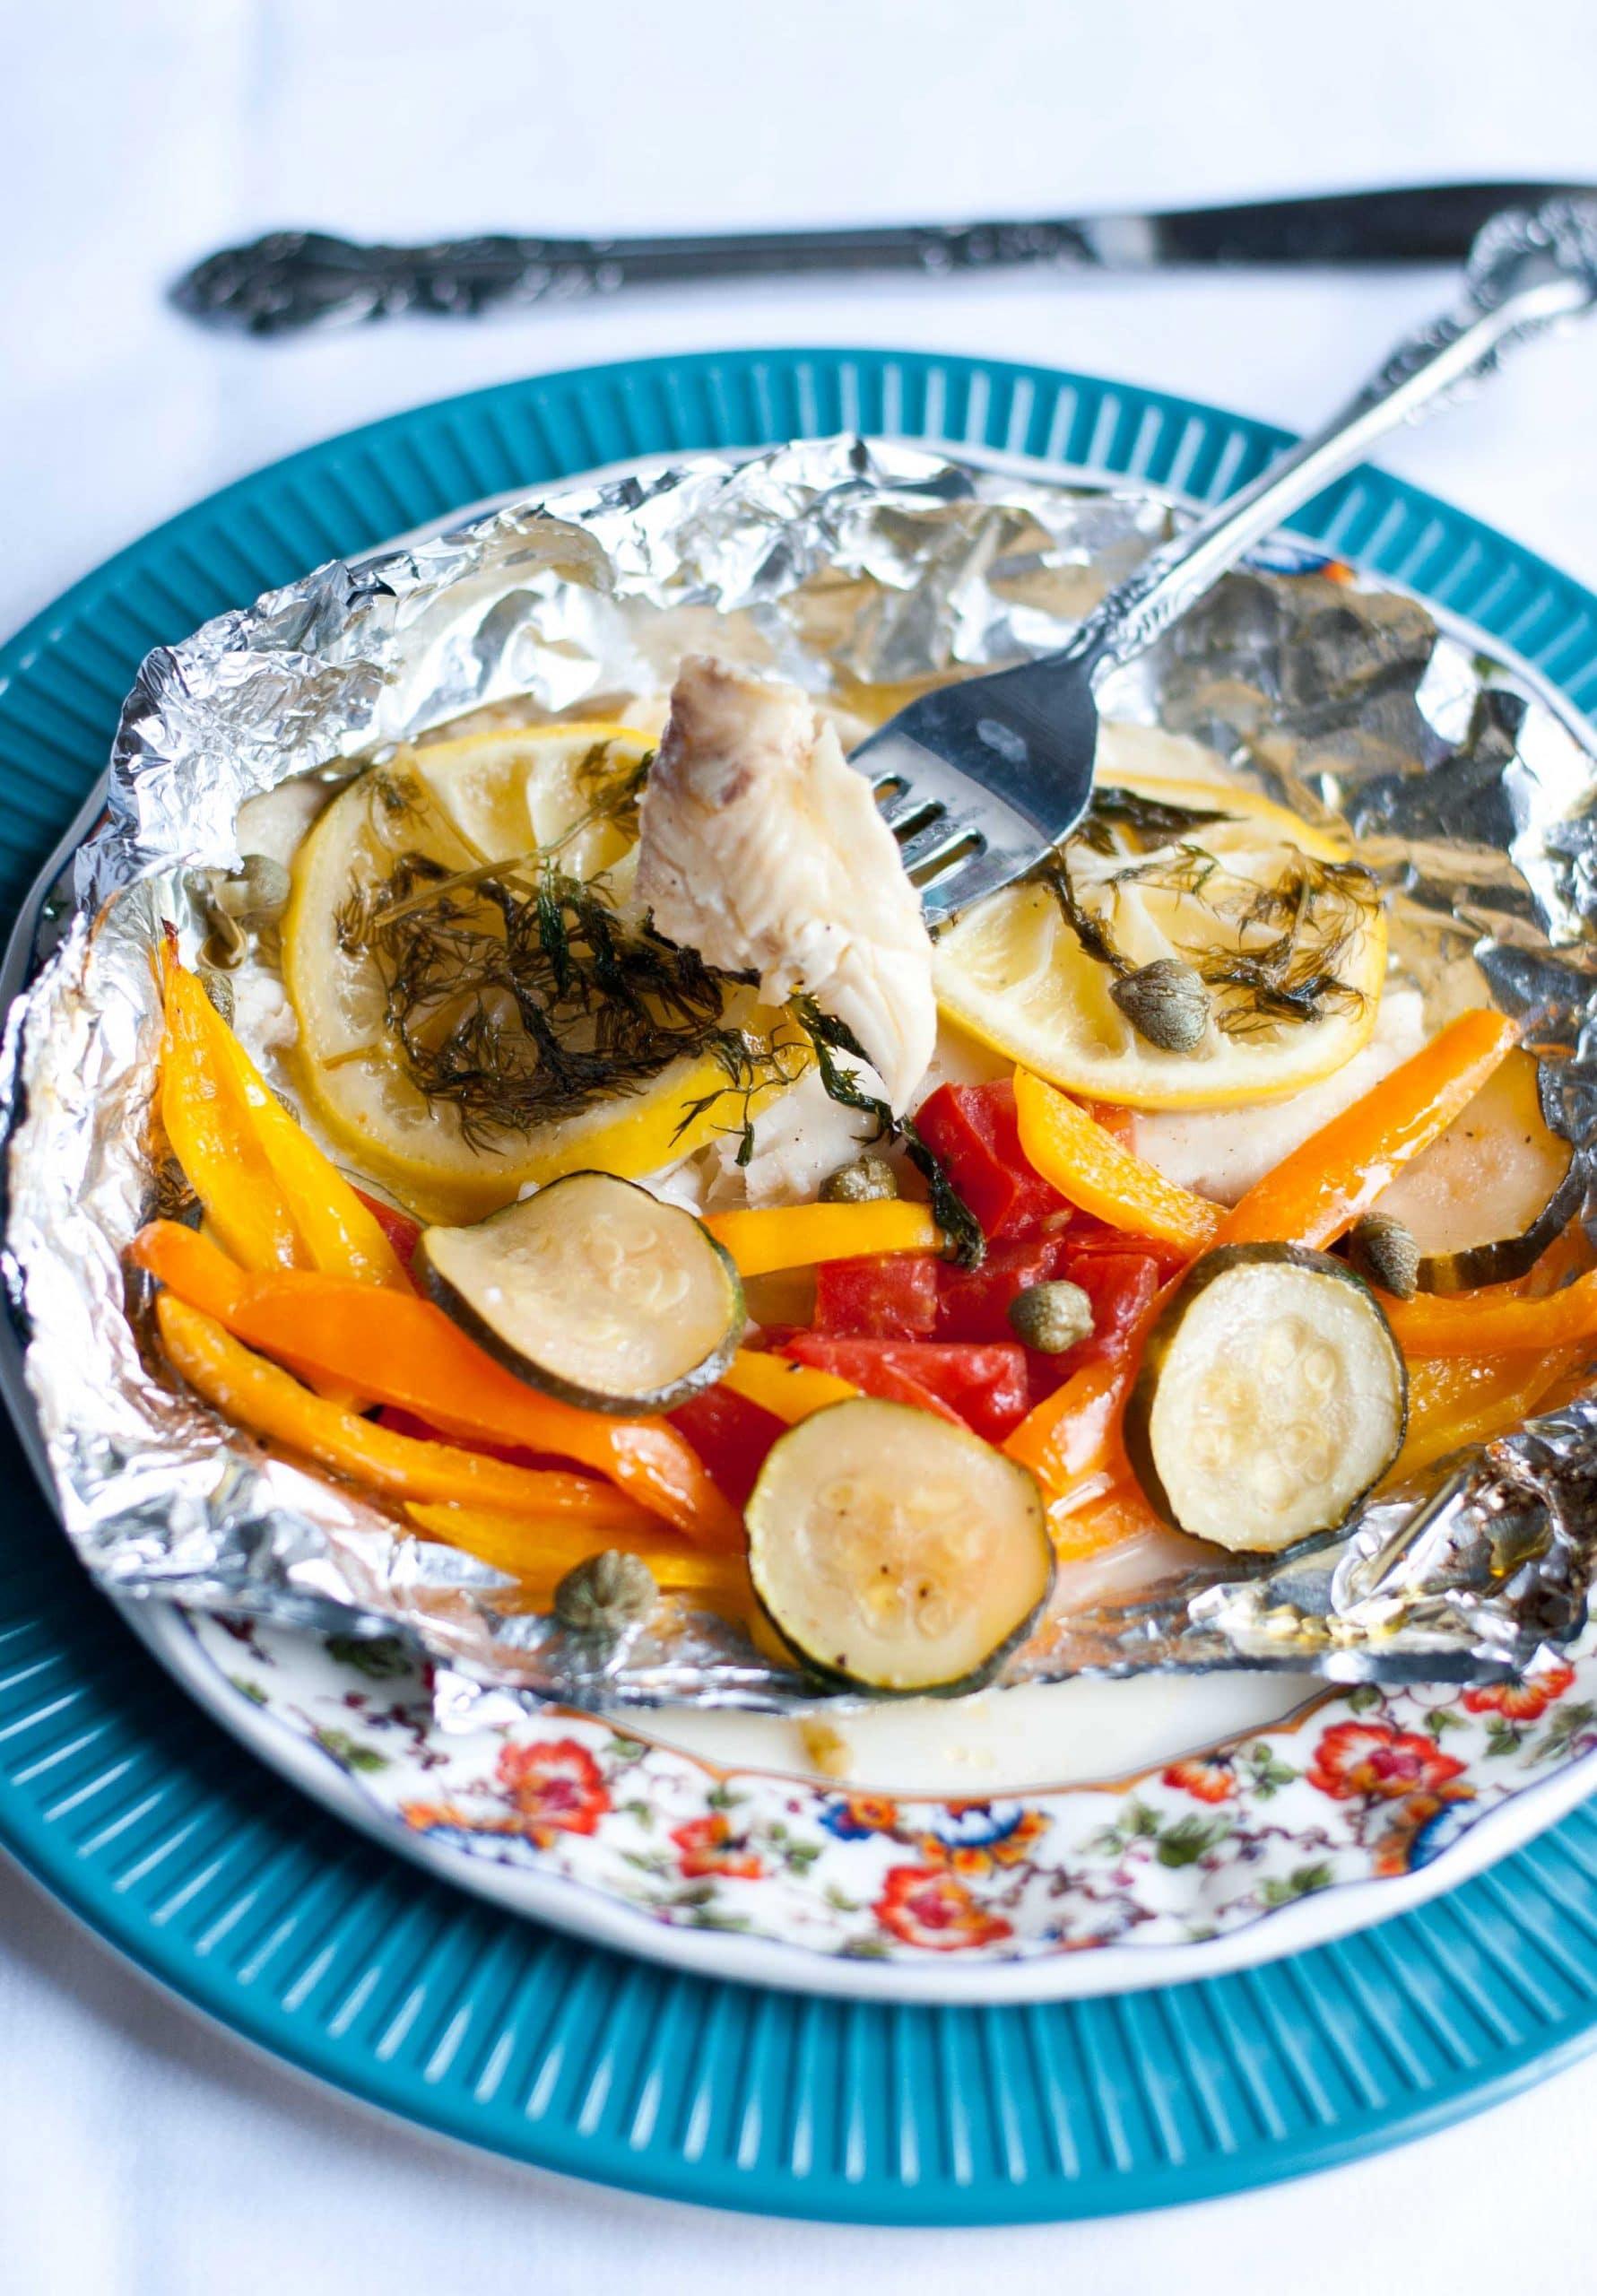 Grilled Lemon Tilapia in a Foil Packet | Neighborfoodblog.com